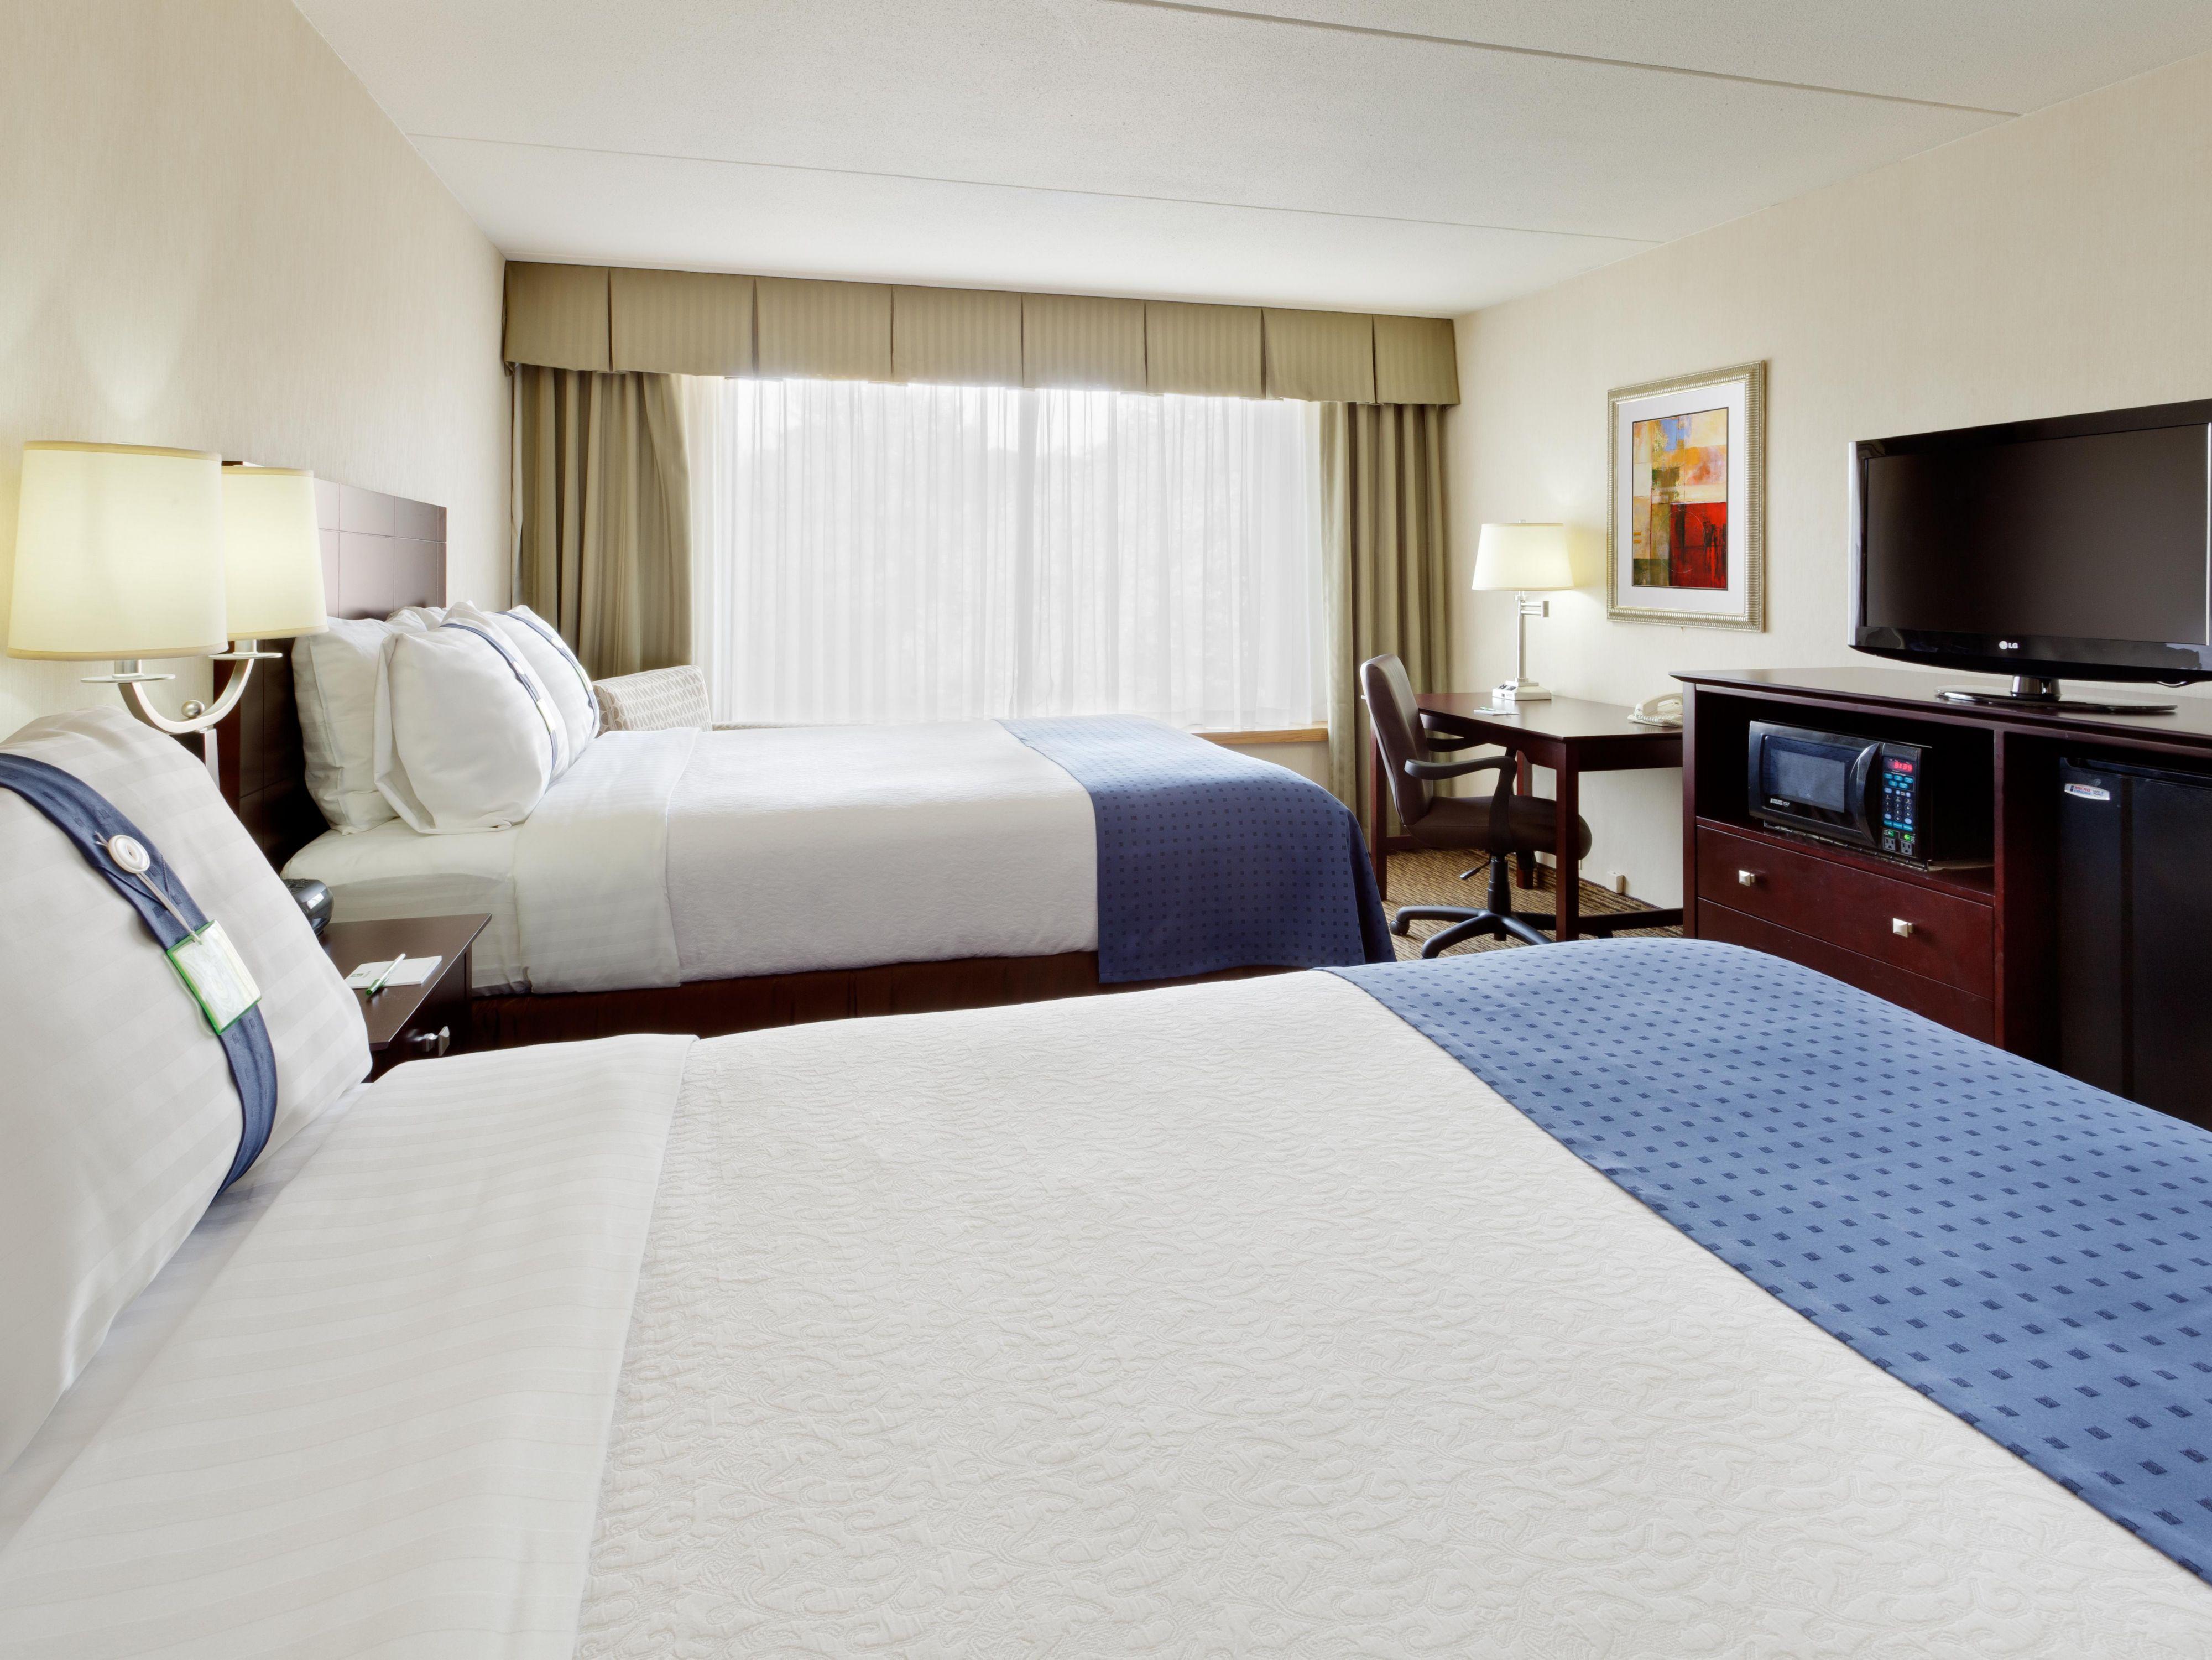 Holiday Inn Springfield South Enfield Ct faciliteiten vergelijken #614733